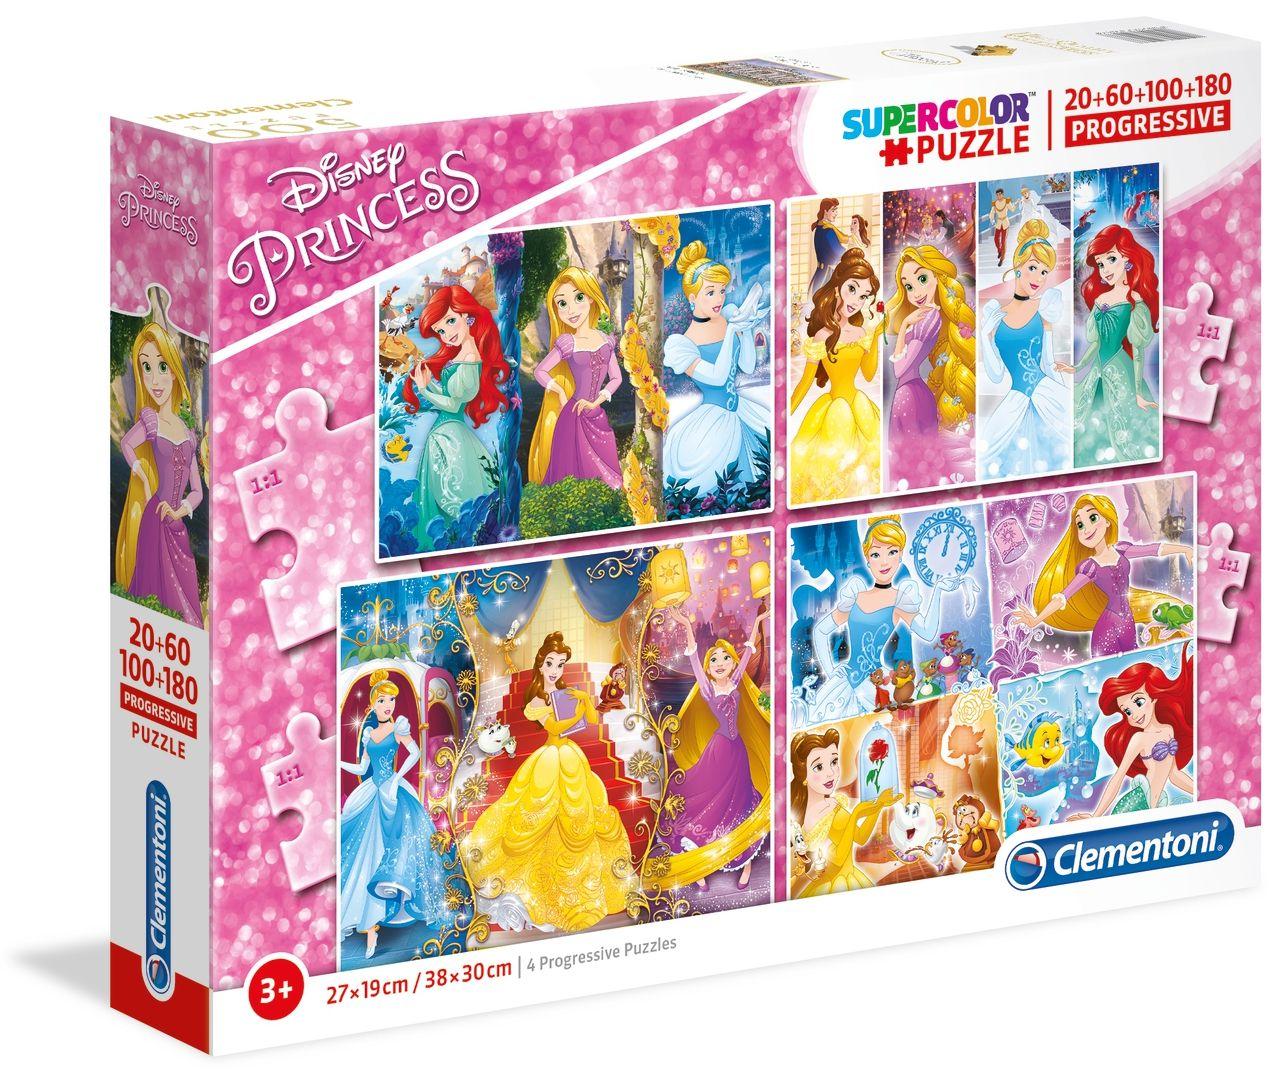 Puzzle 20+60+100+180 piese Clementoni Princess imagine hippoland.ro